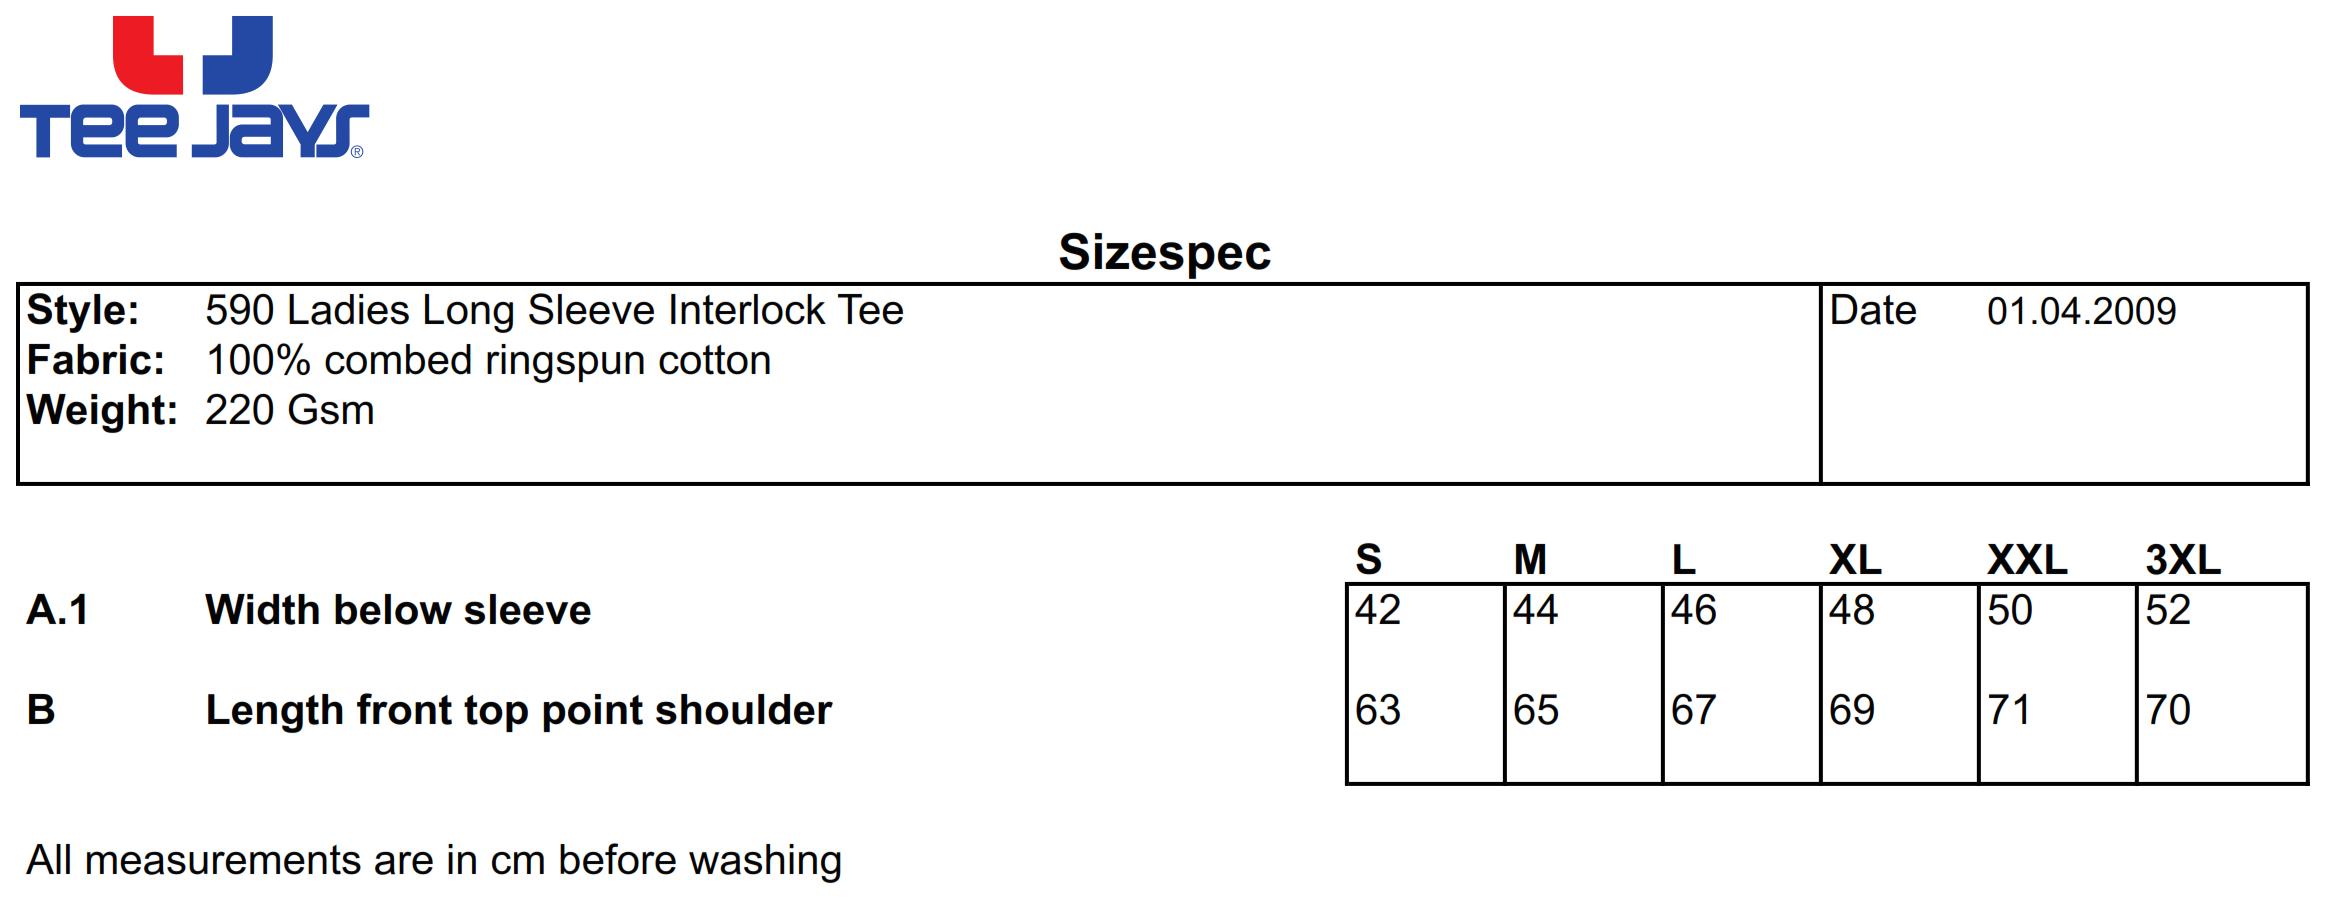 Tee Jays: Ladies LS Interlock T-Shirt 590